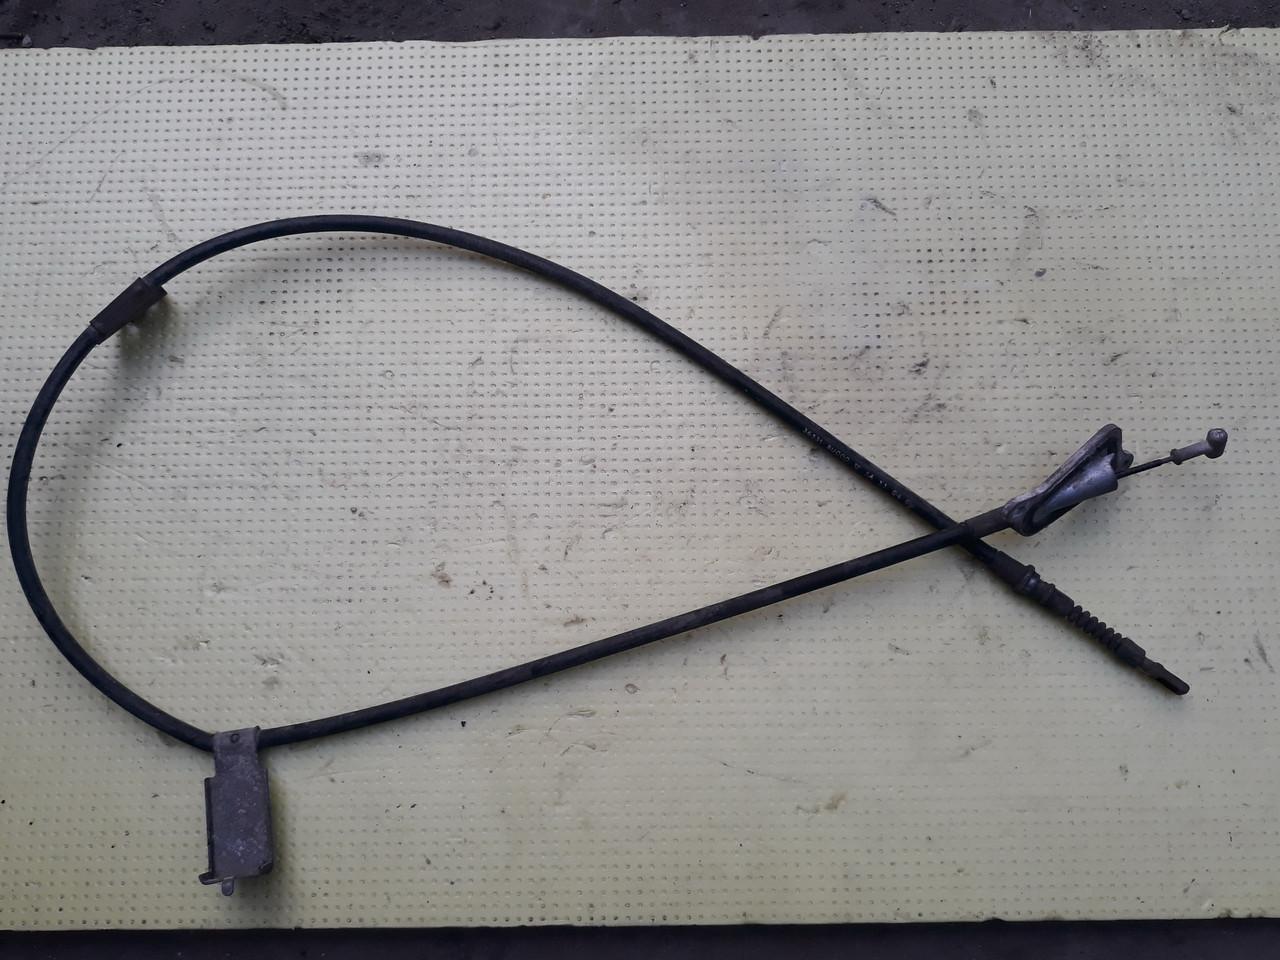 Трос стояночного тормоза ручника левый задний Nissan Almera Tino V10 36531-BU000 36531BU000